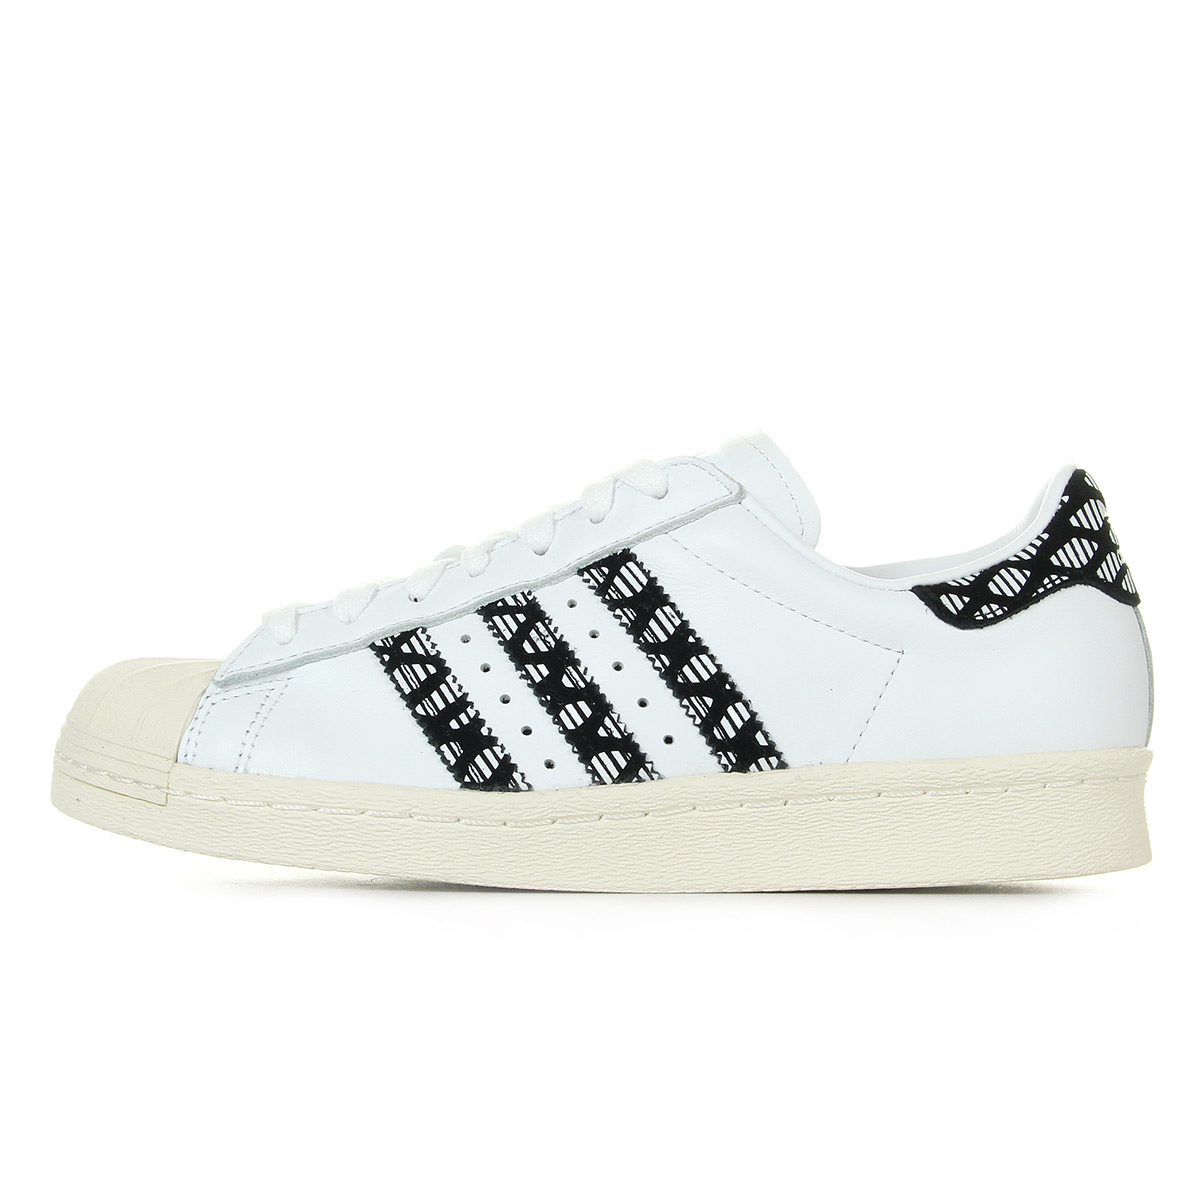 Baskets Adidas Superstar 80s Python Noir Femme | Products